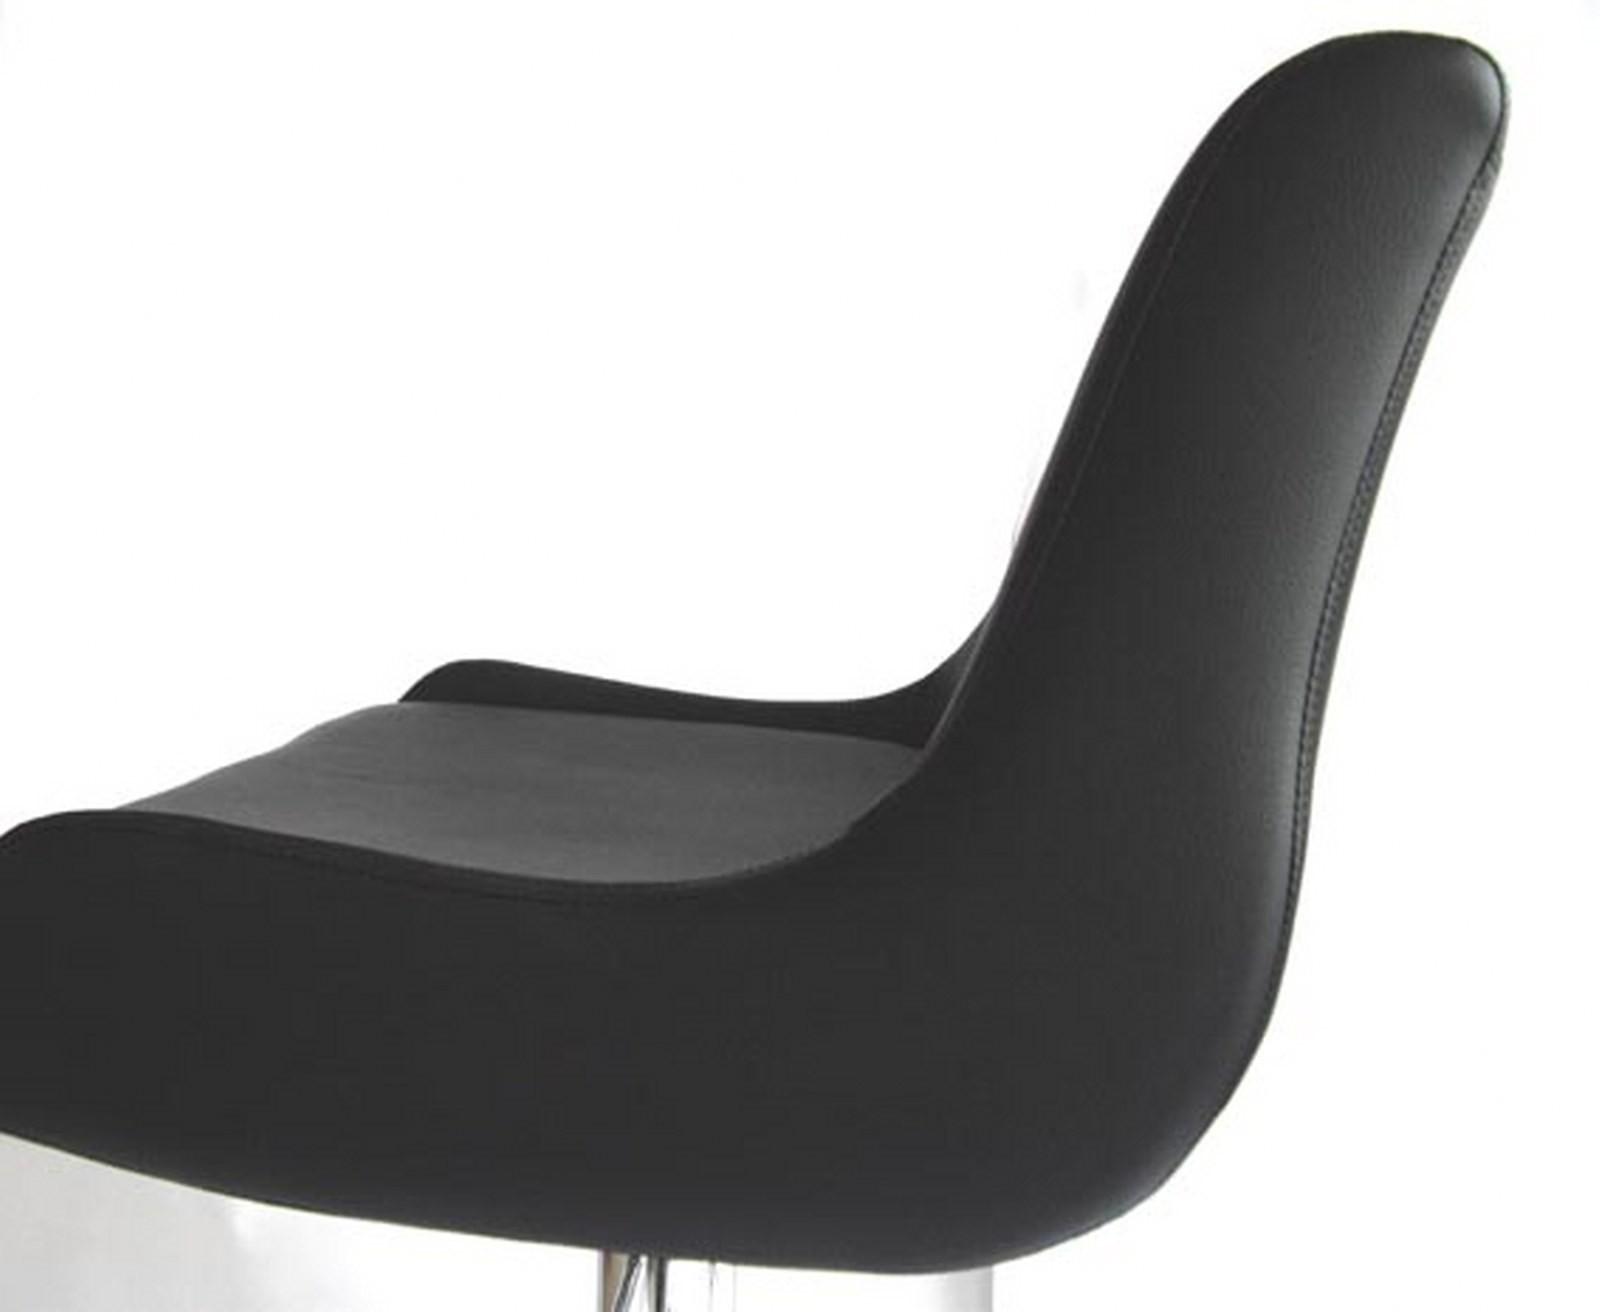 Sgabelli sgabello sedia sedie girevole seduta regolabile in eco